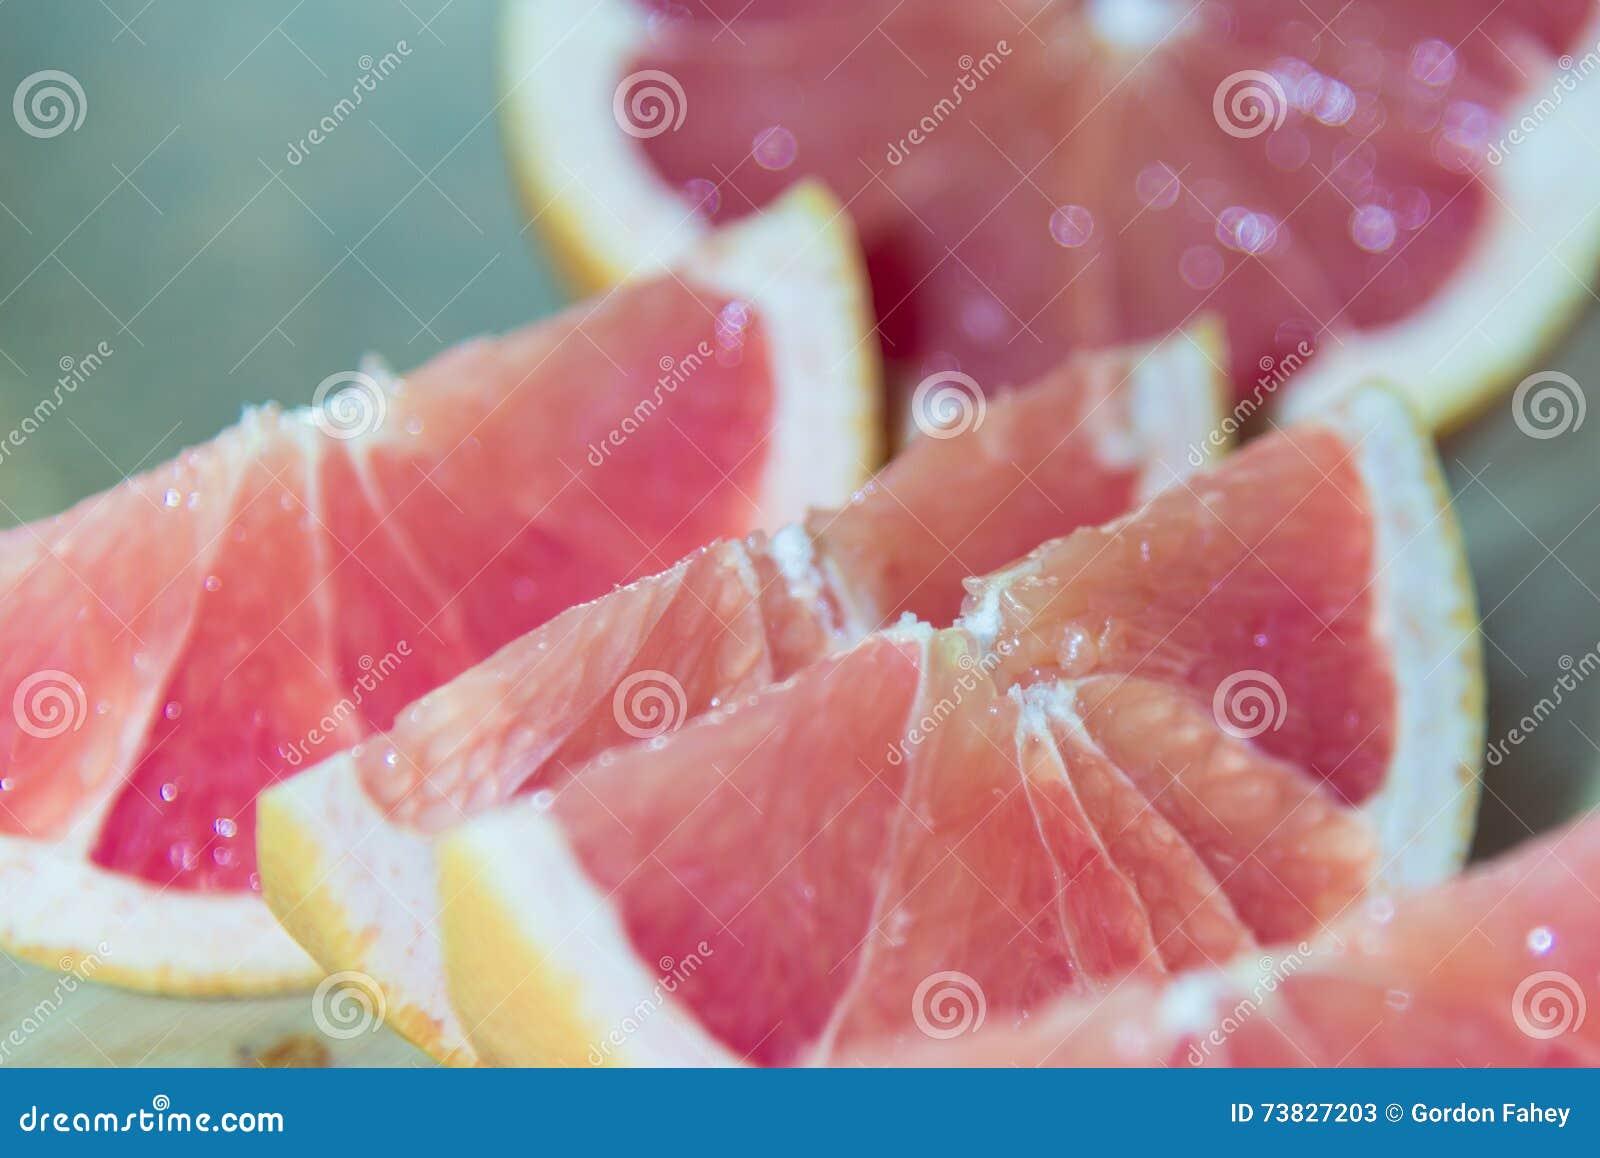 Frühstücks-Pampelmusen-Umhüllung